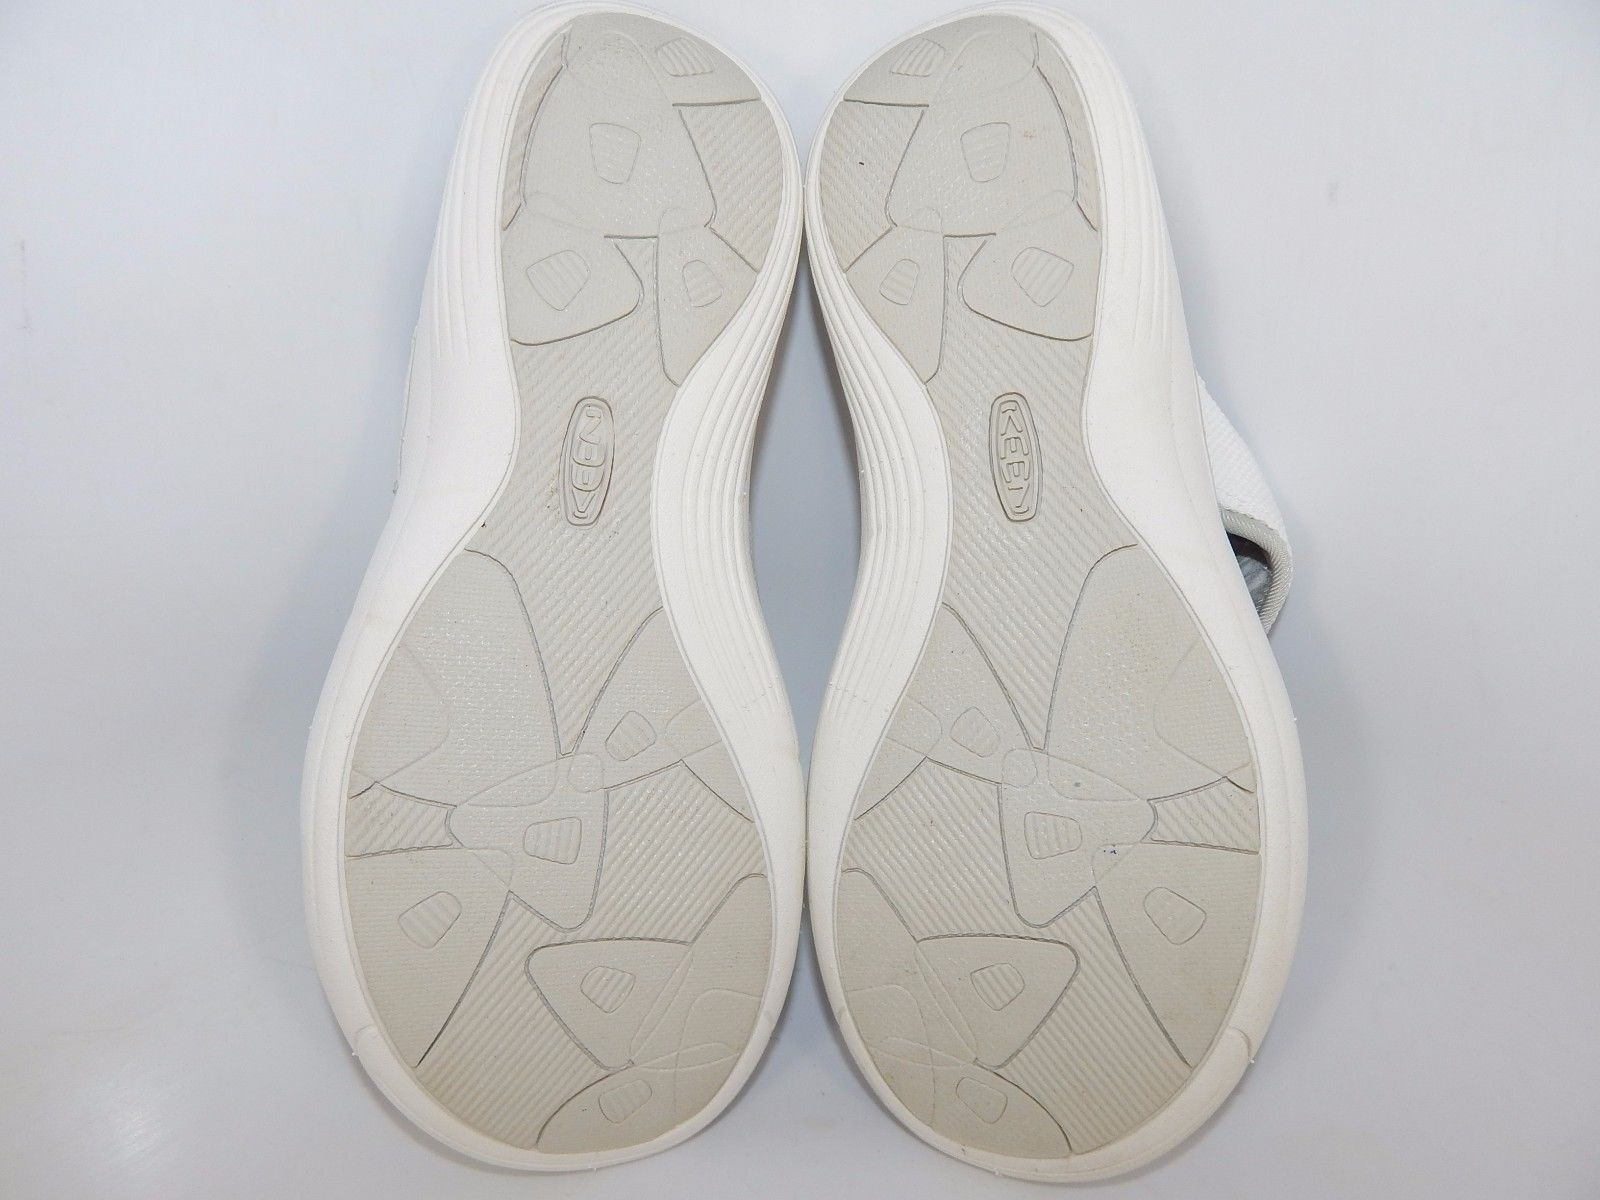 Keen Maya Flip Women's Sports Sandals Size US 7 M (B) EU 37.5 Star White